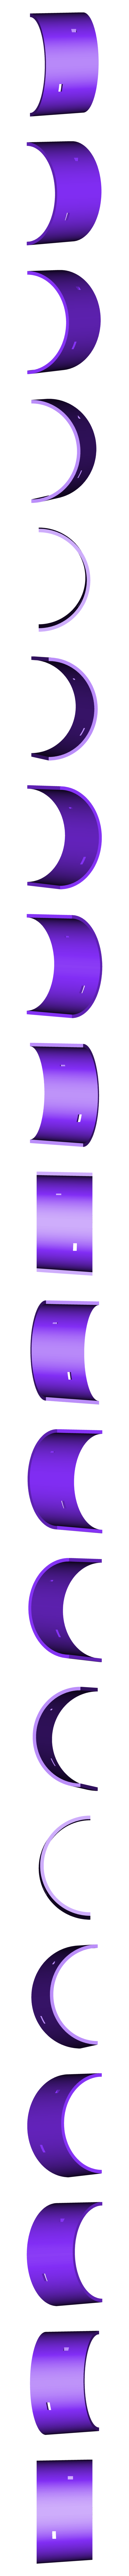 Boiler_Section_1_-_SCALED_Part_3b-.STL Download free STL file 4-8-8-4 Big Boy Locomotive • 3D printer object, RaymondDeLuca